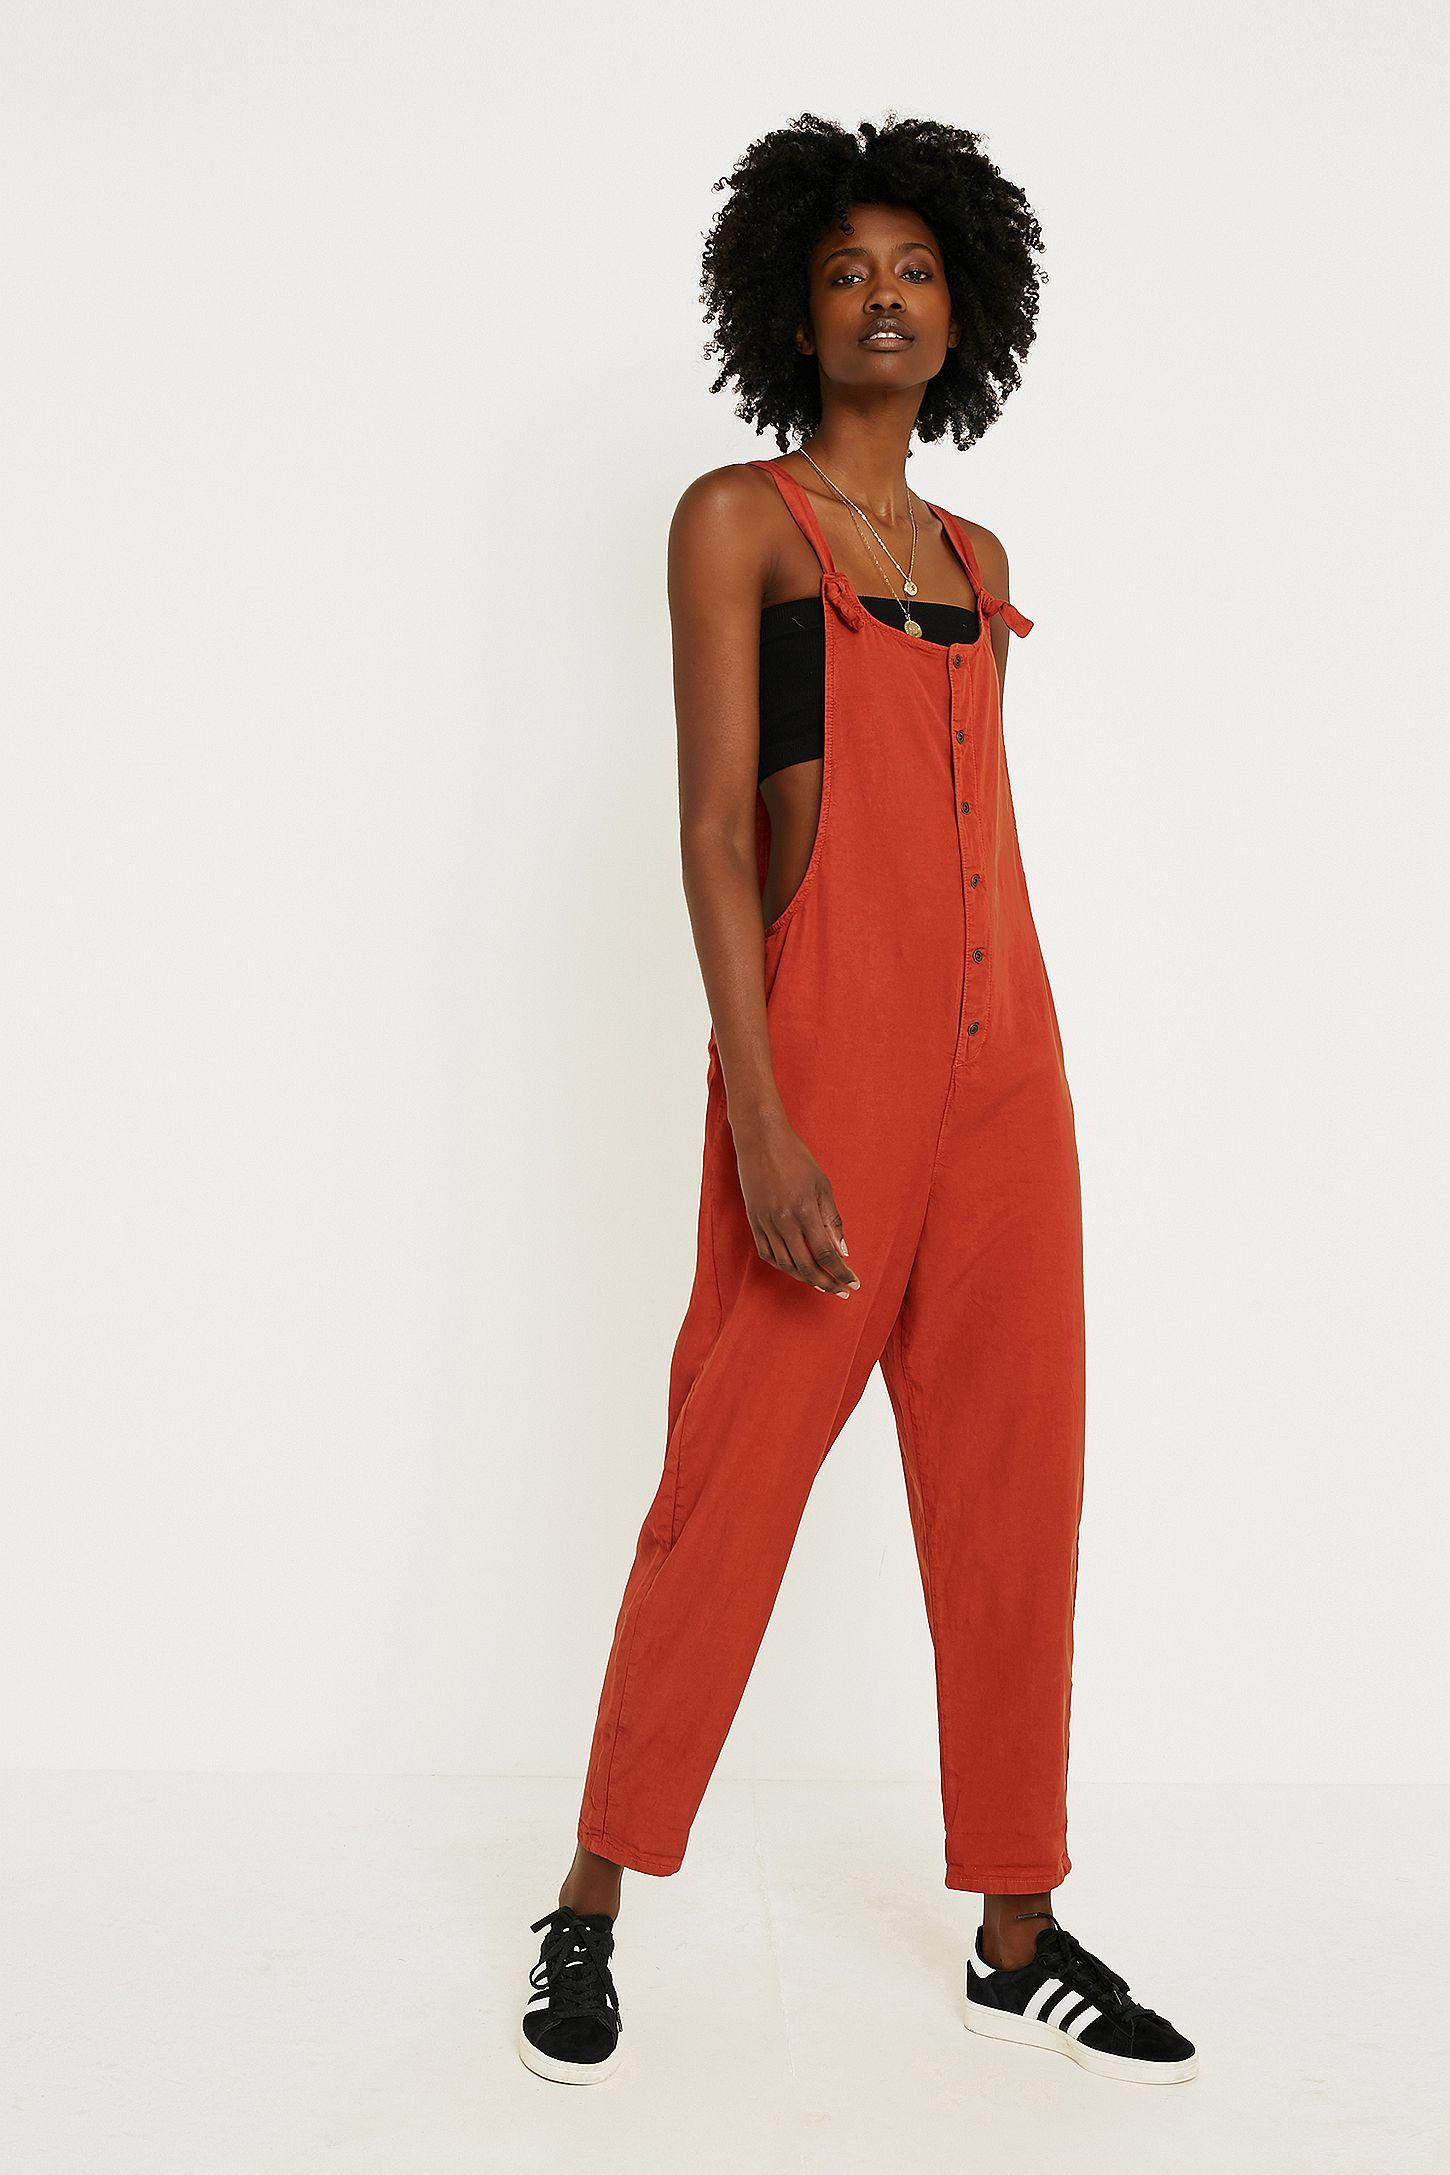 356d3d800069 UO Orange Shauny Dungaree Jumpsuit